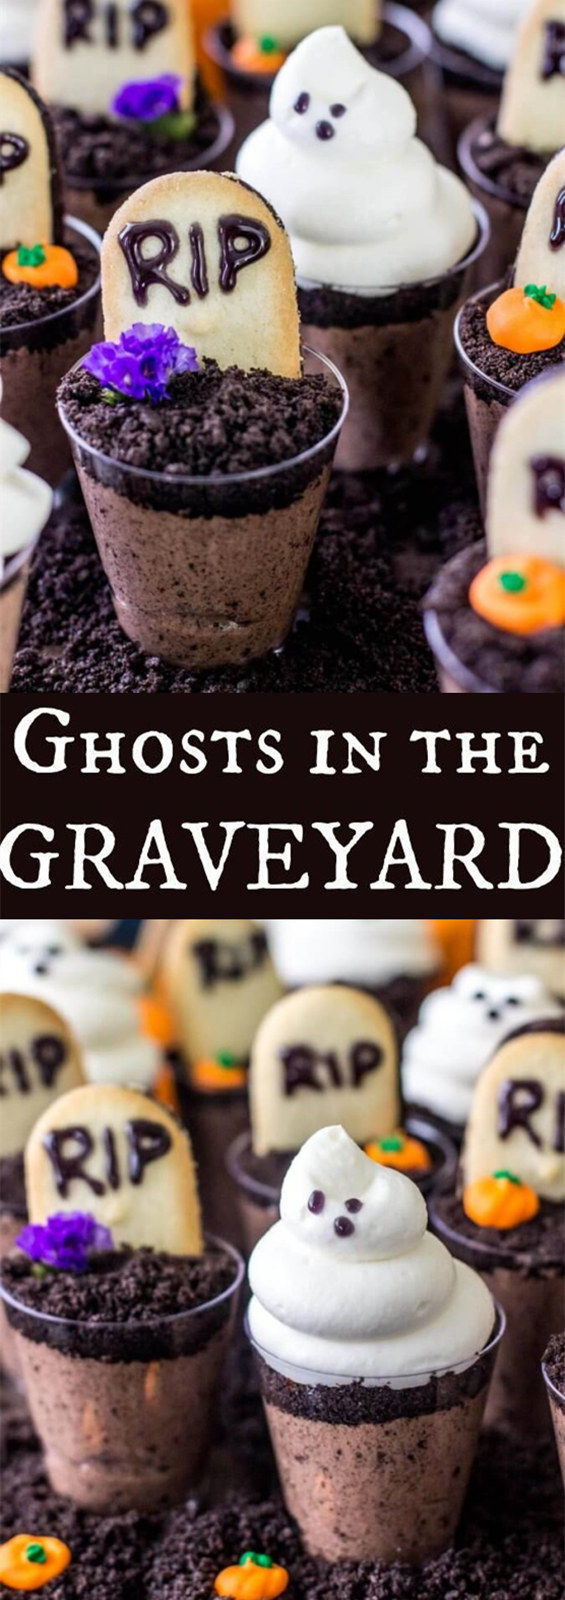 Ghosts in the Graveyard Halloween Dessert Shooters